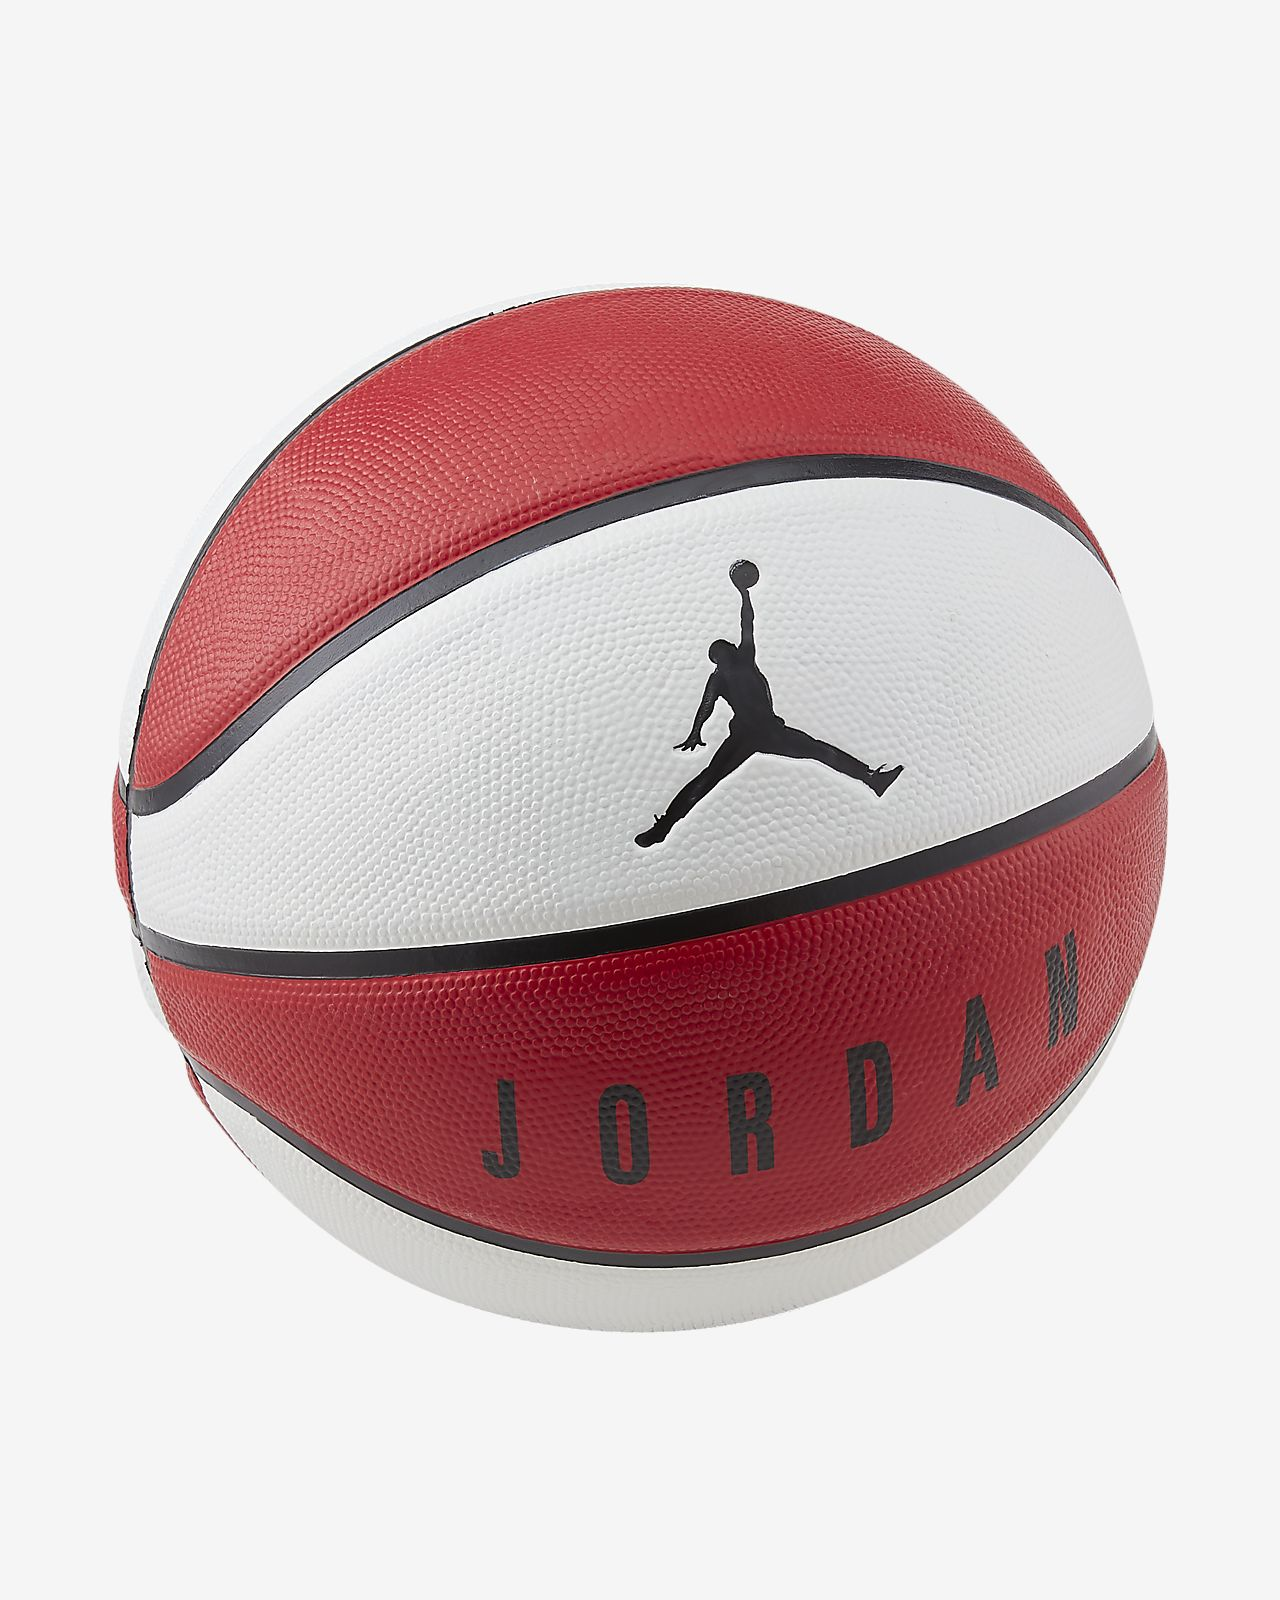 Bola de basquetebol Jordan Playground 8P